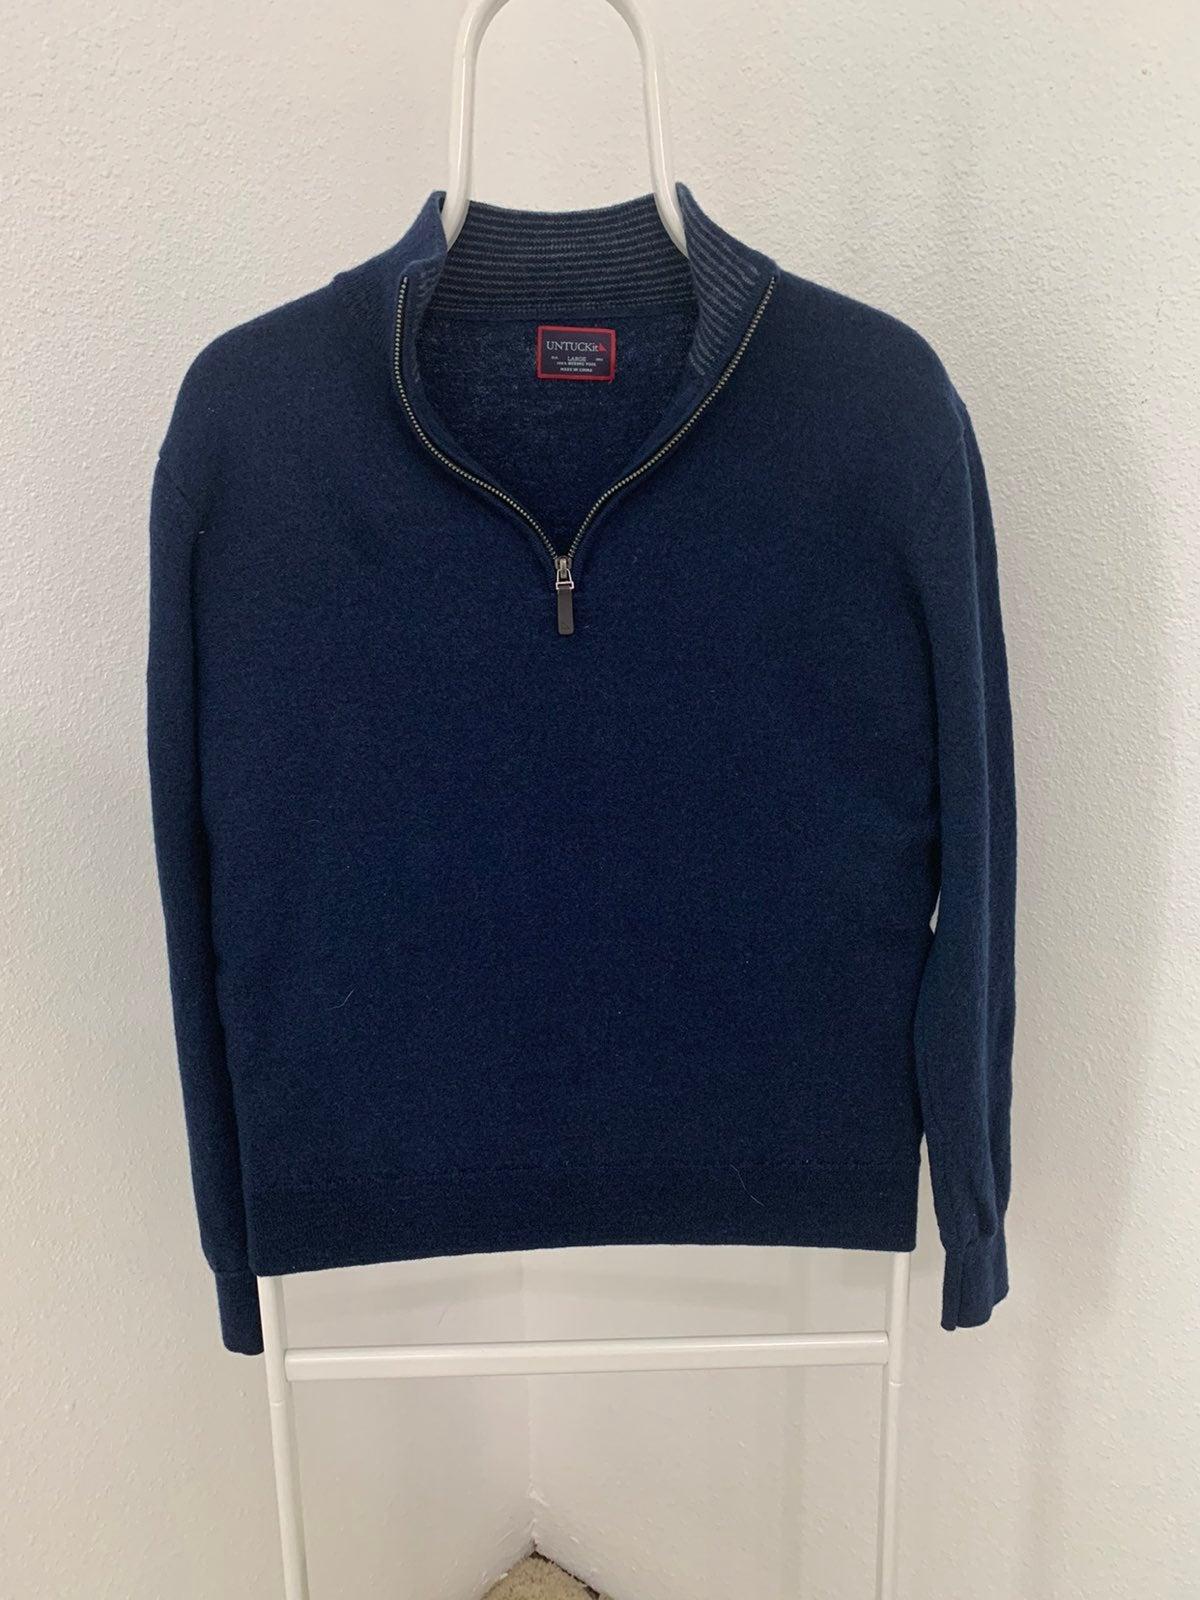 Mens Untuckit 1/4 Zip Sweater 100% Wool